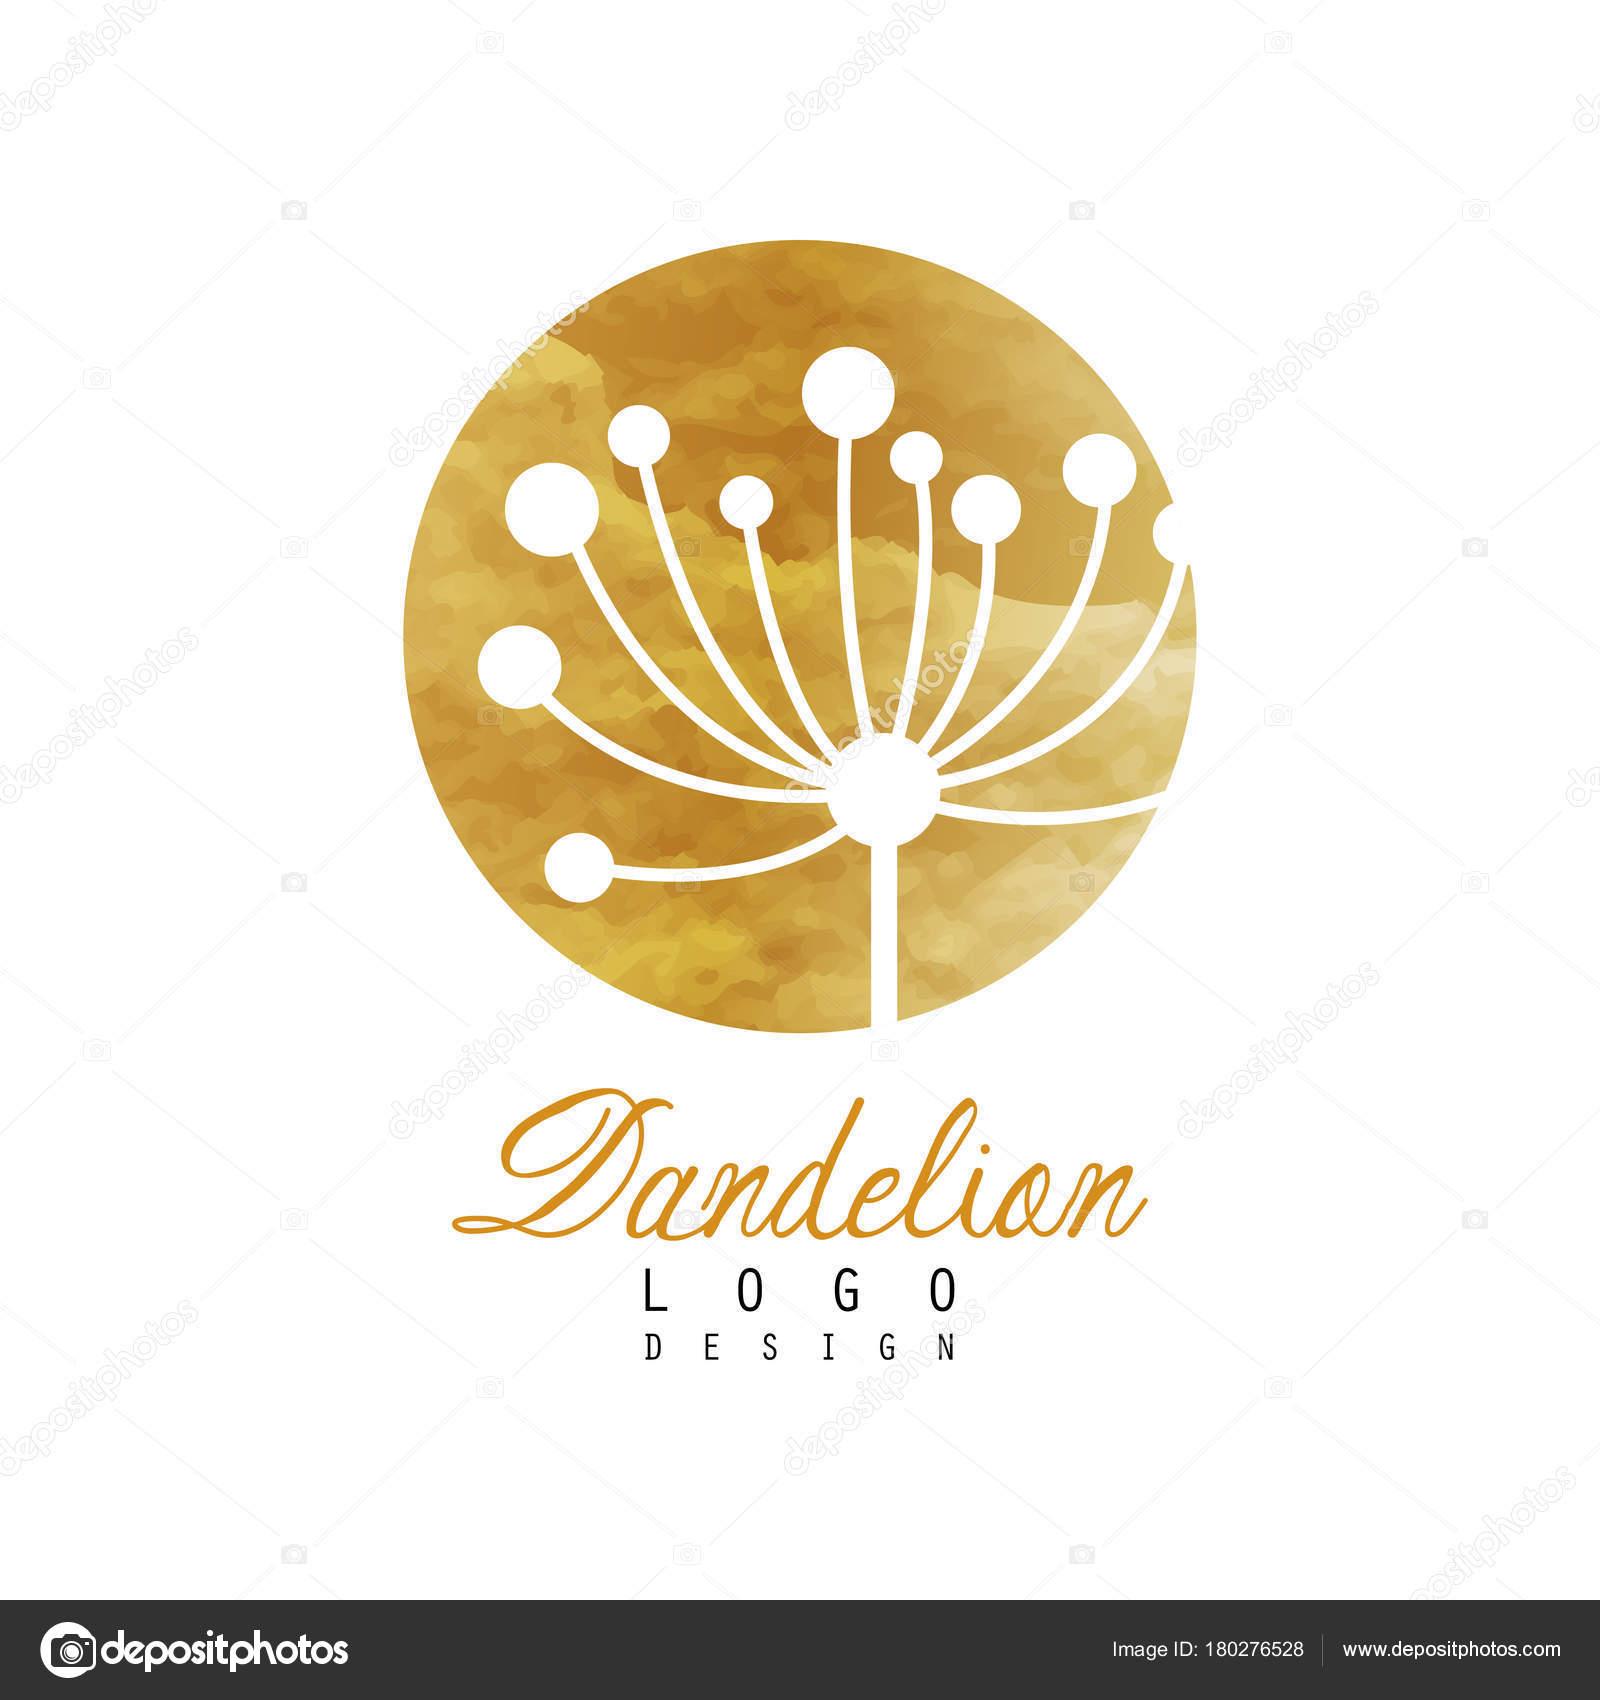 dandelion logo design template gentle golden texture abstract icon